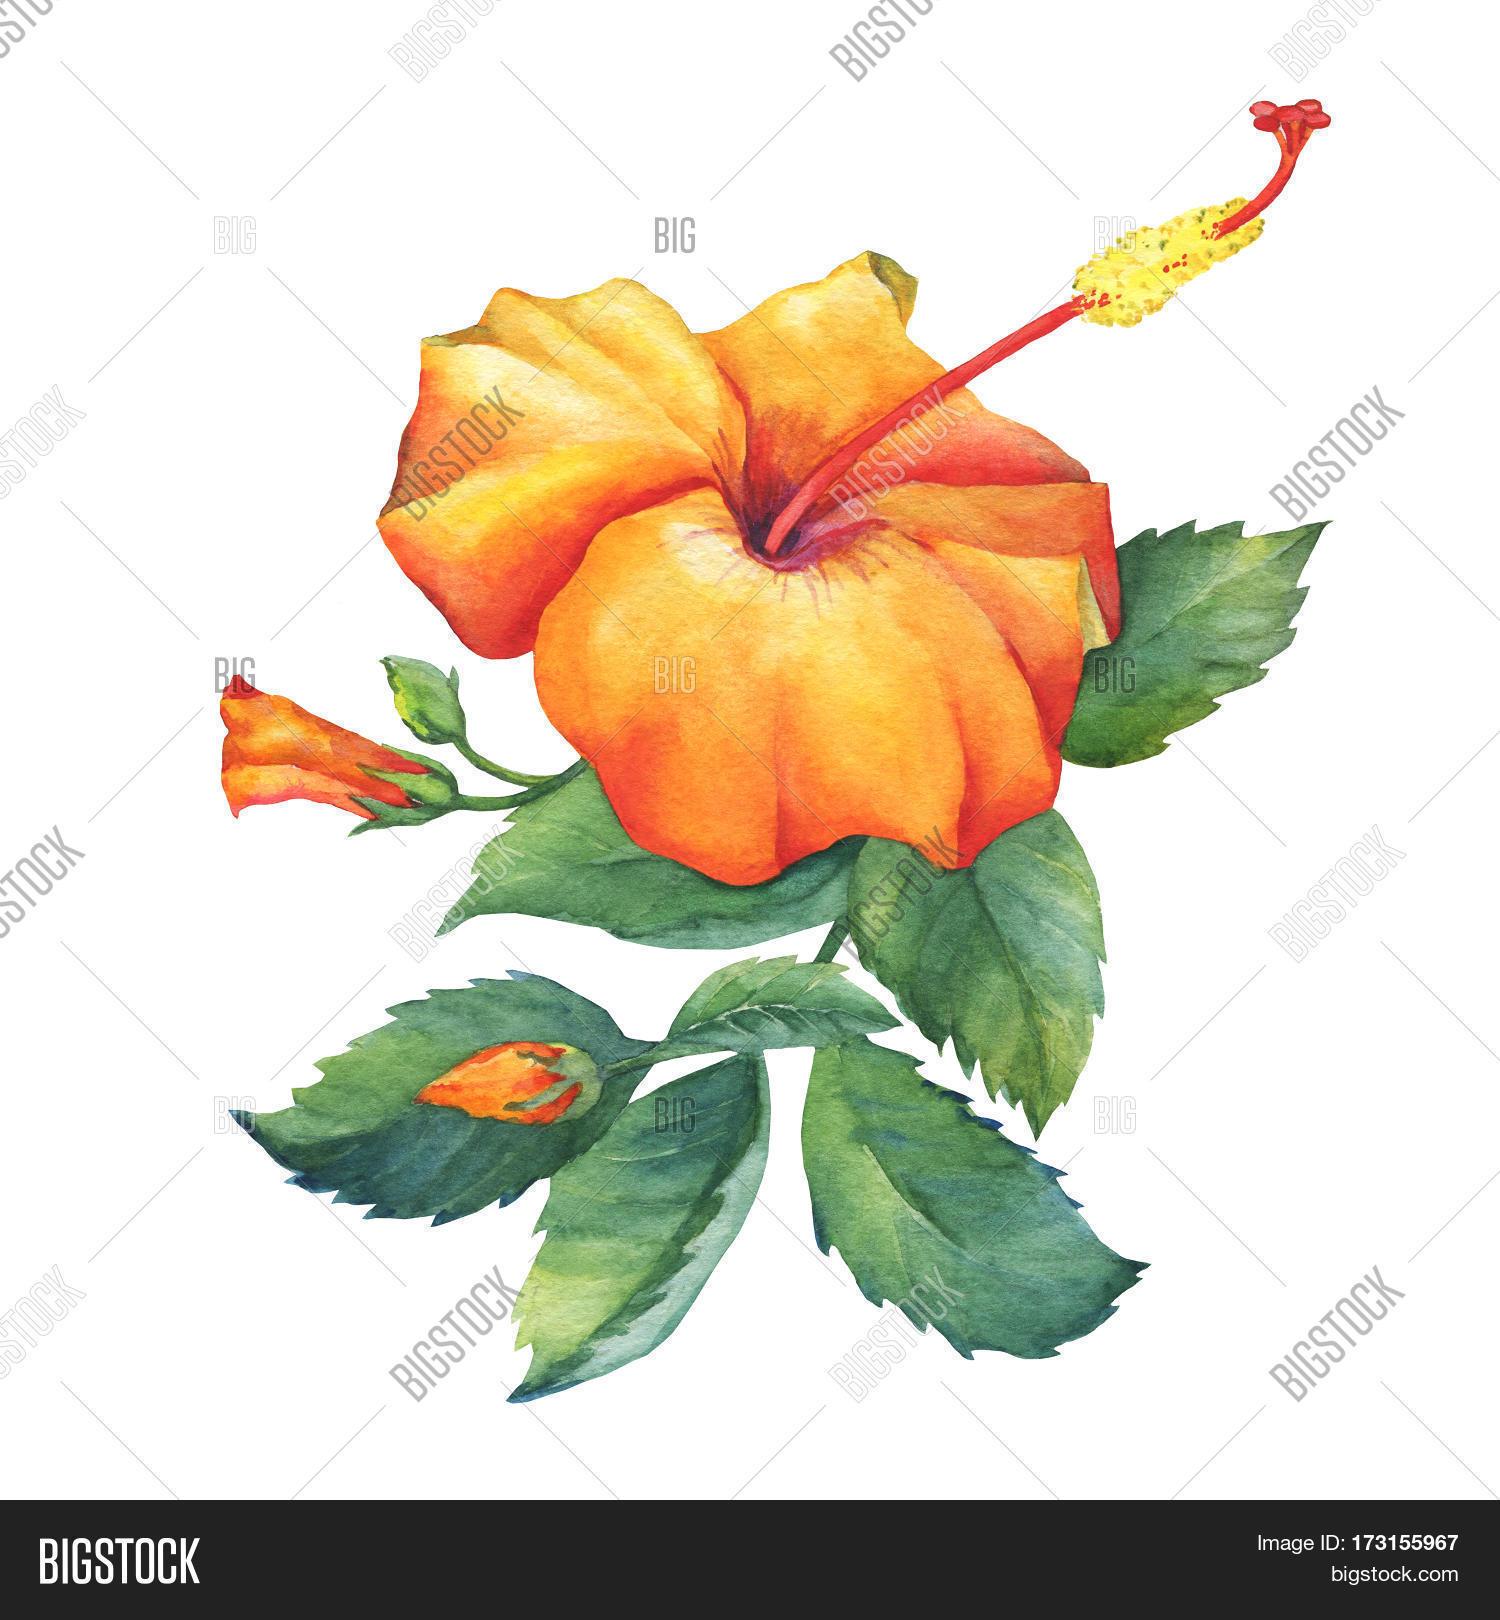 Orange hibiscus flower image photo free trial bigstock orange hibiscus flower hand drawn watercolor painting on white background izmirmasajfo